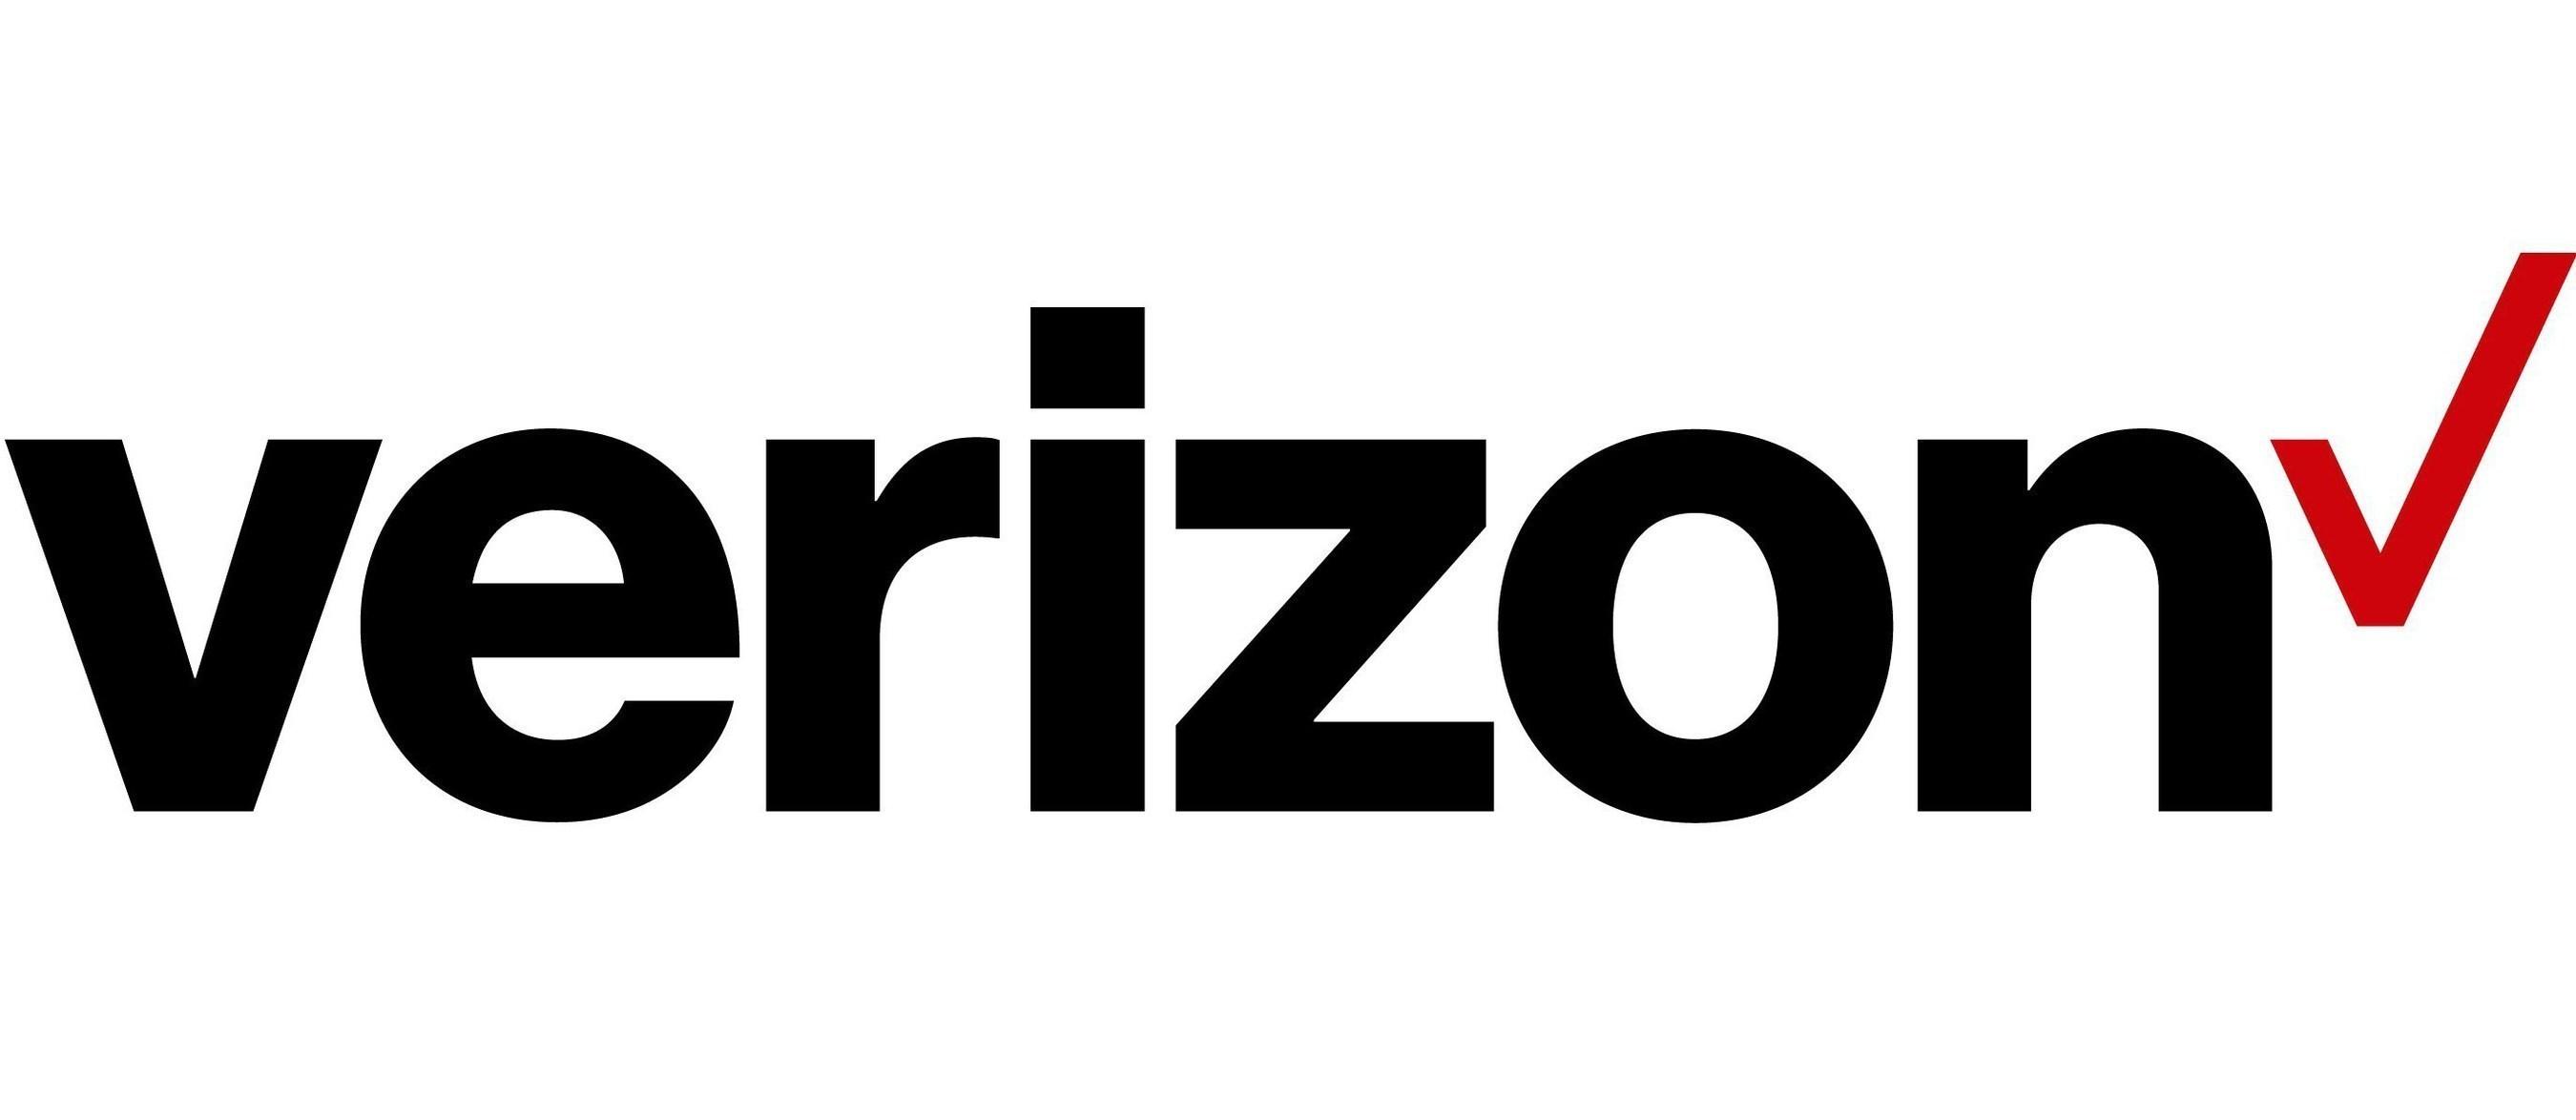 Verizon Enterprise Solutions introduces Virtual Network